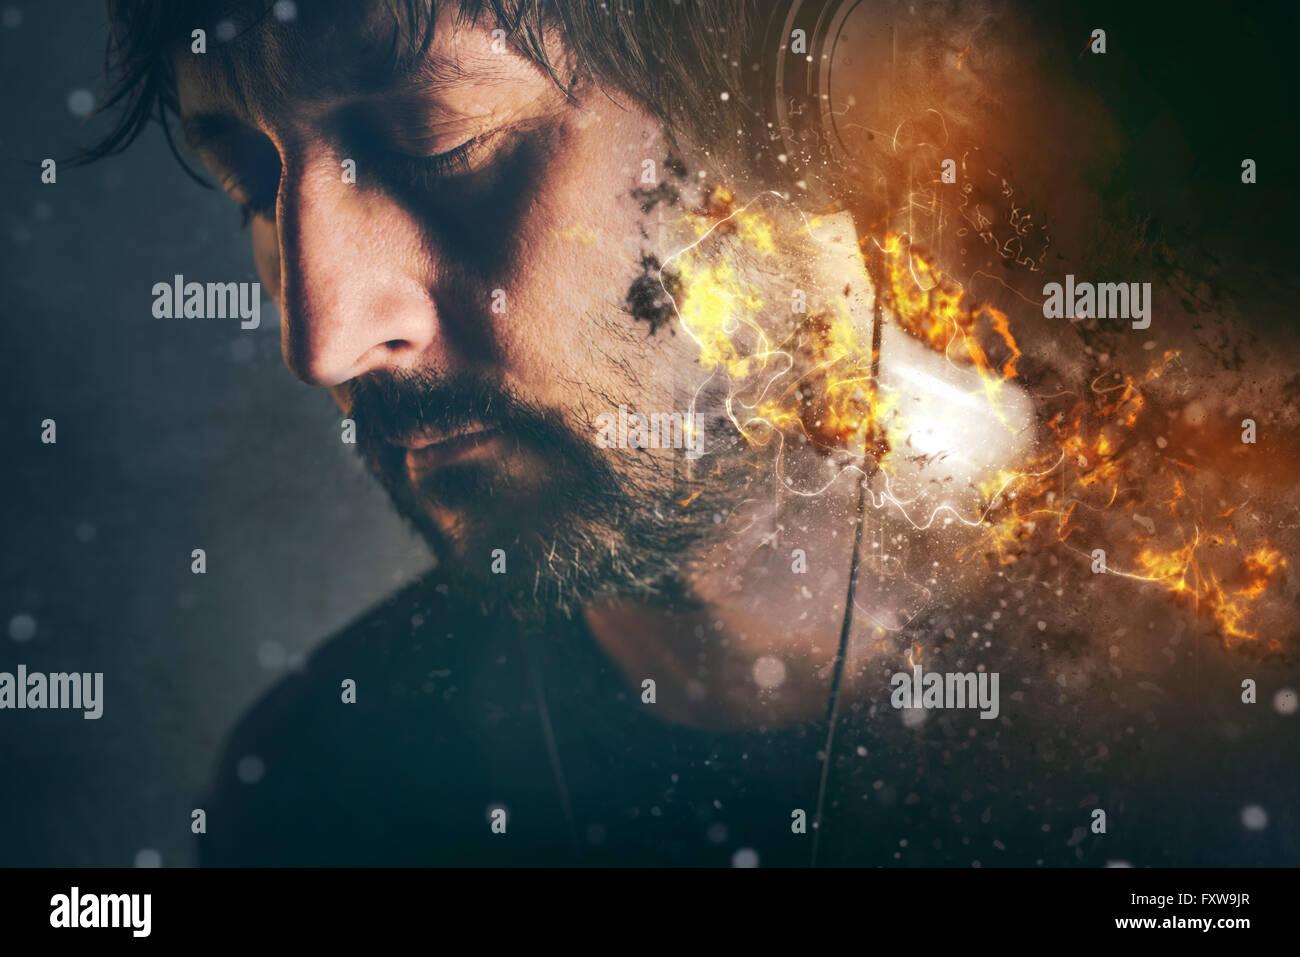 DJ in Brand, Mann mit brennenden Kopfhörer genießen Lieblingslied oder Musik, selektiven Fokus Stockbild